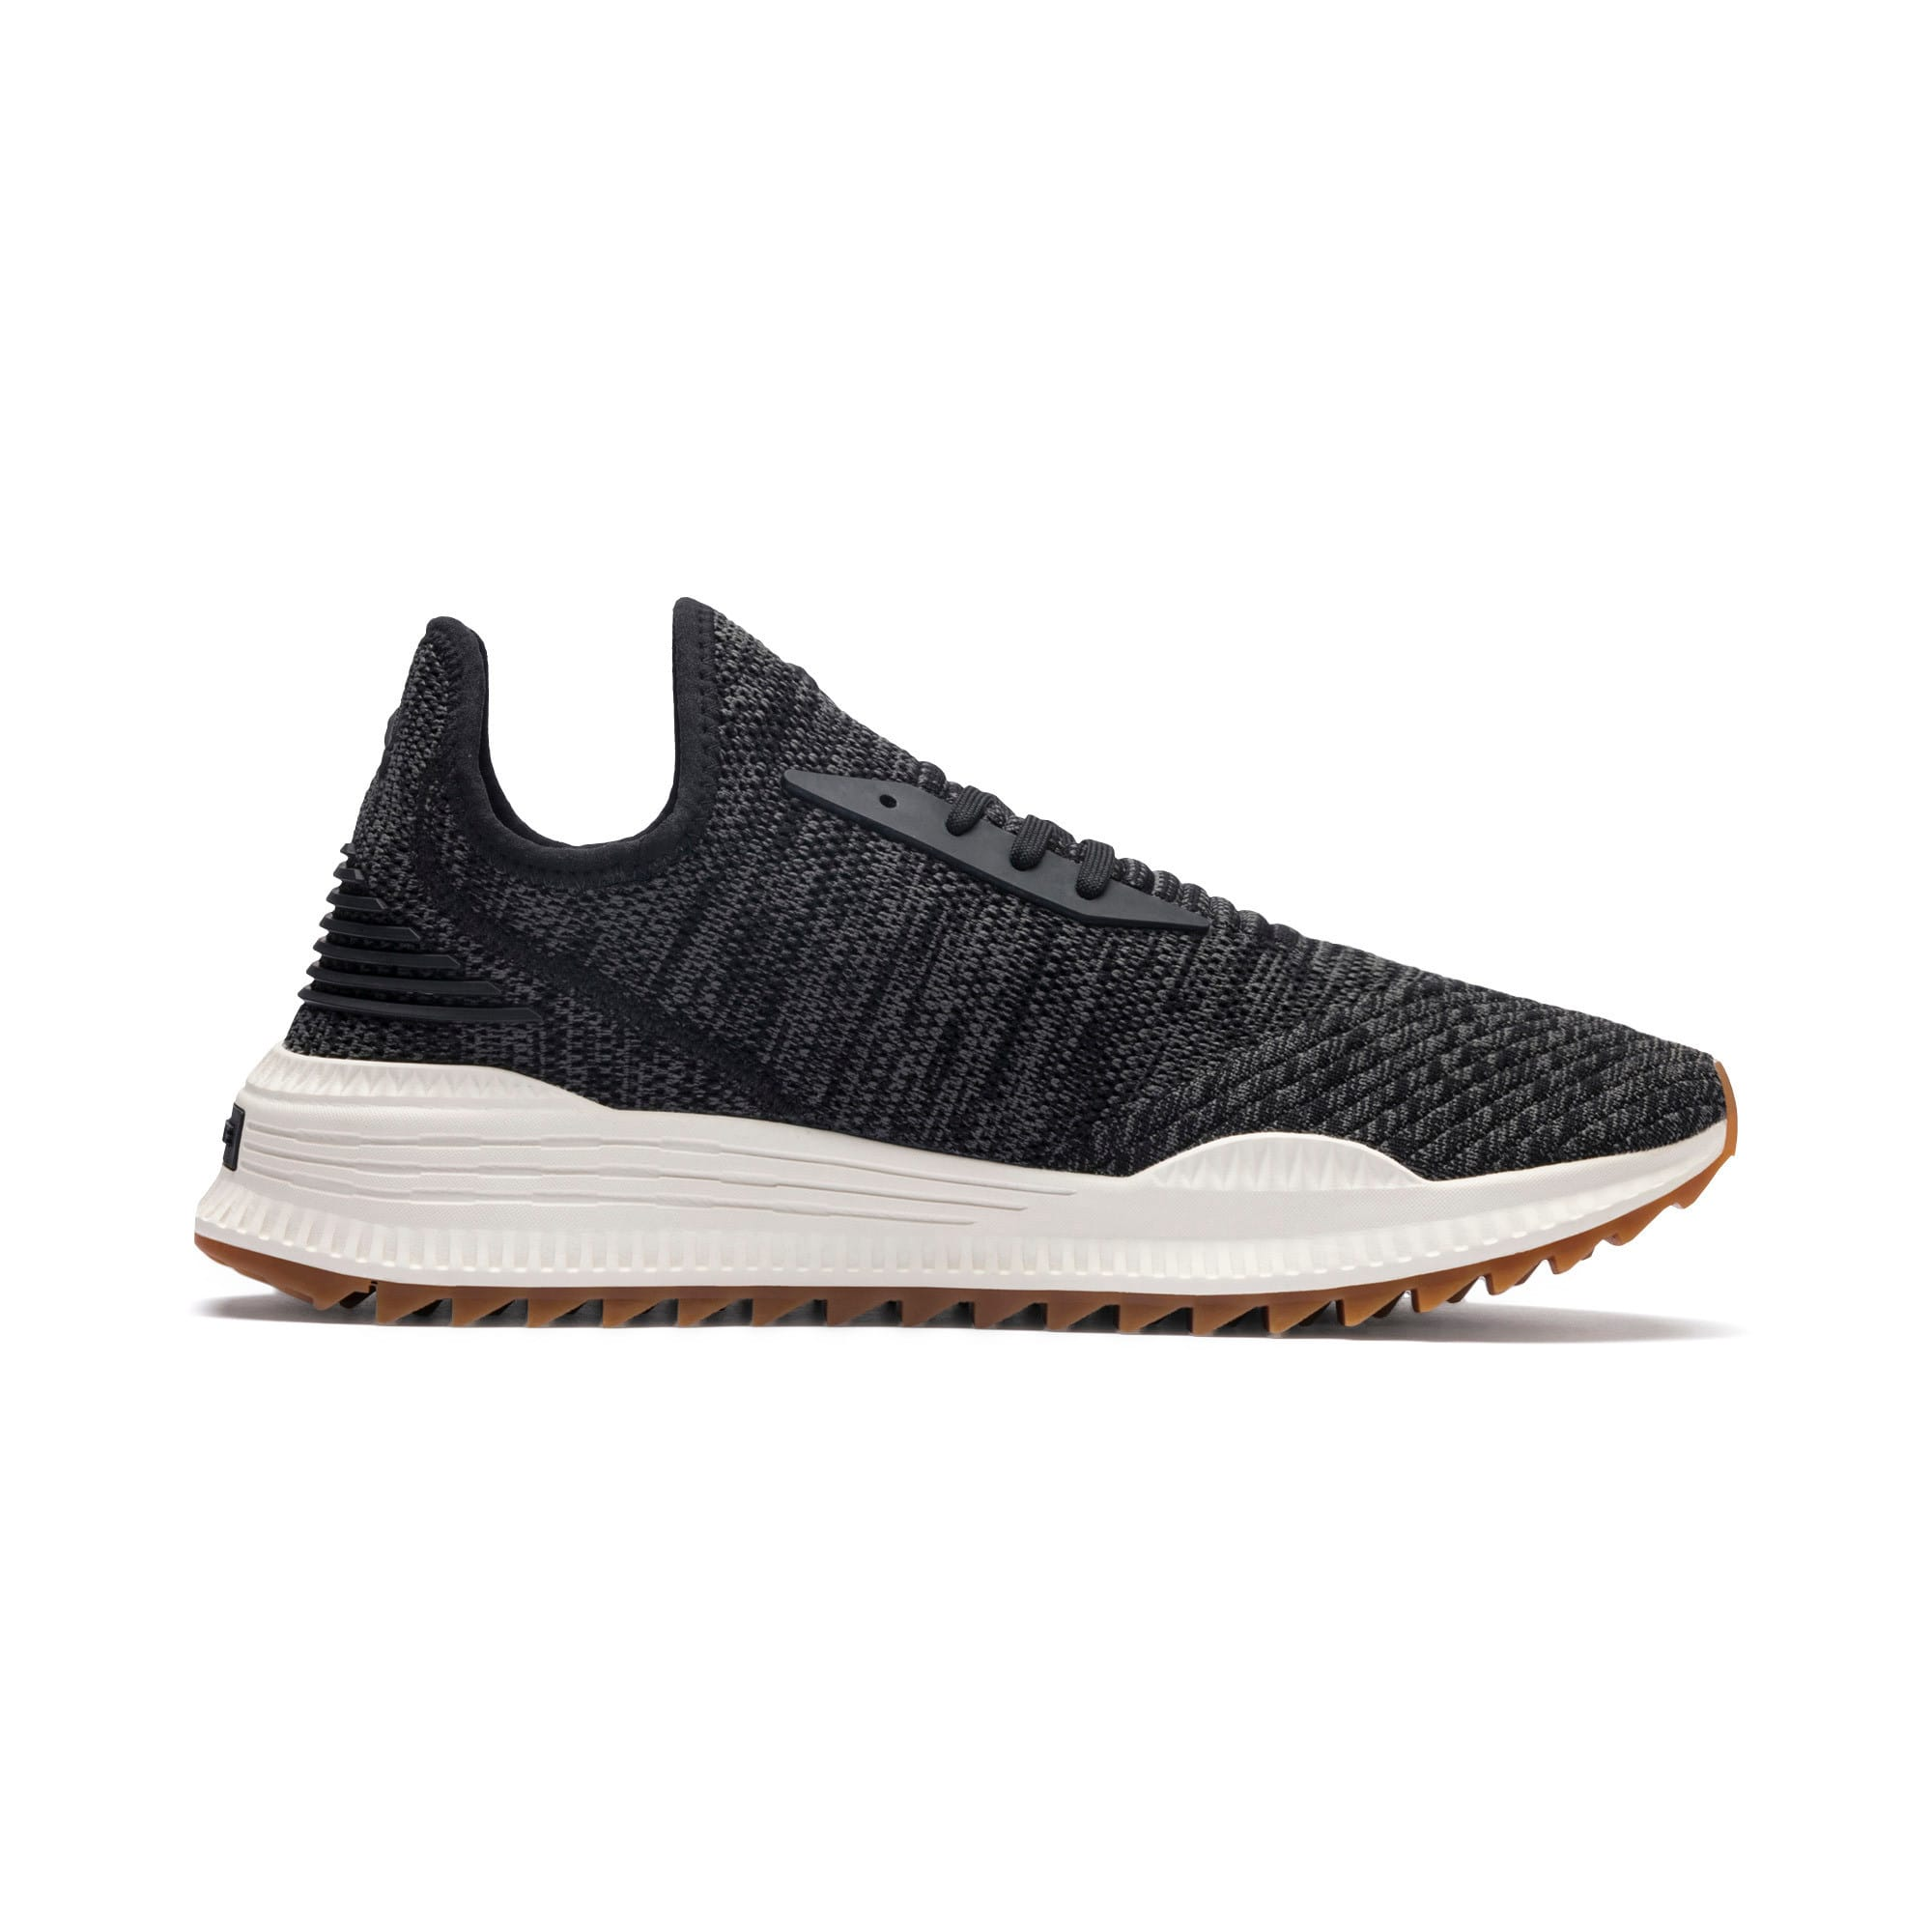 Thumbnail 5 of AVID Repellent Sneakers, Puma Black-Dark Shadow, medium